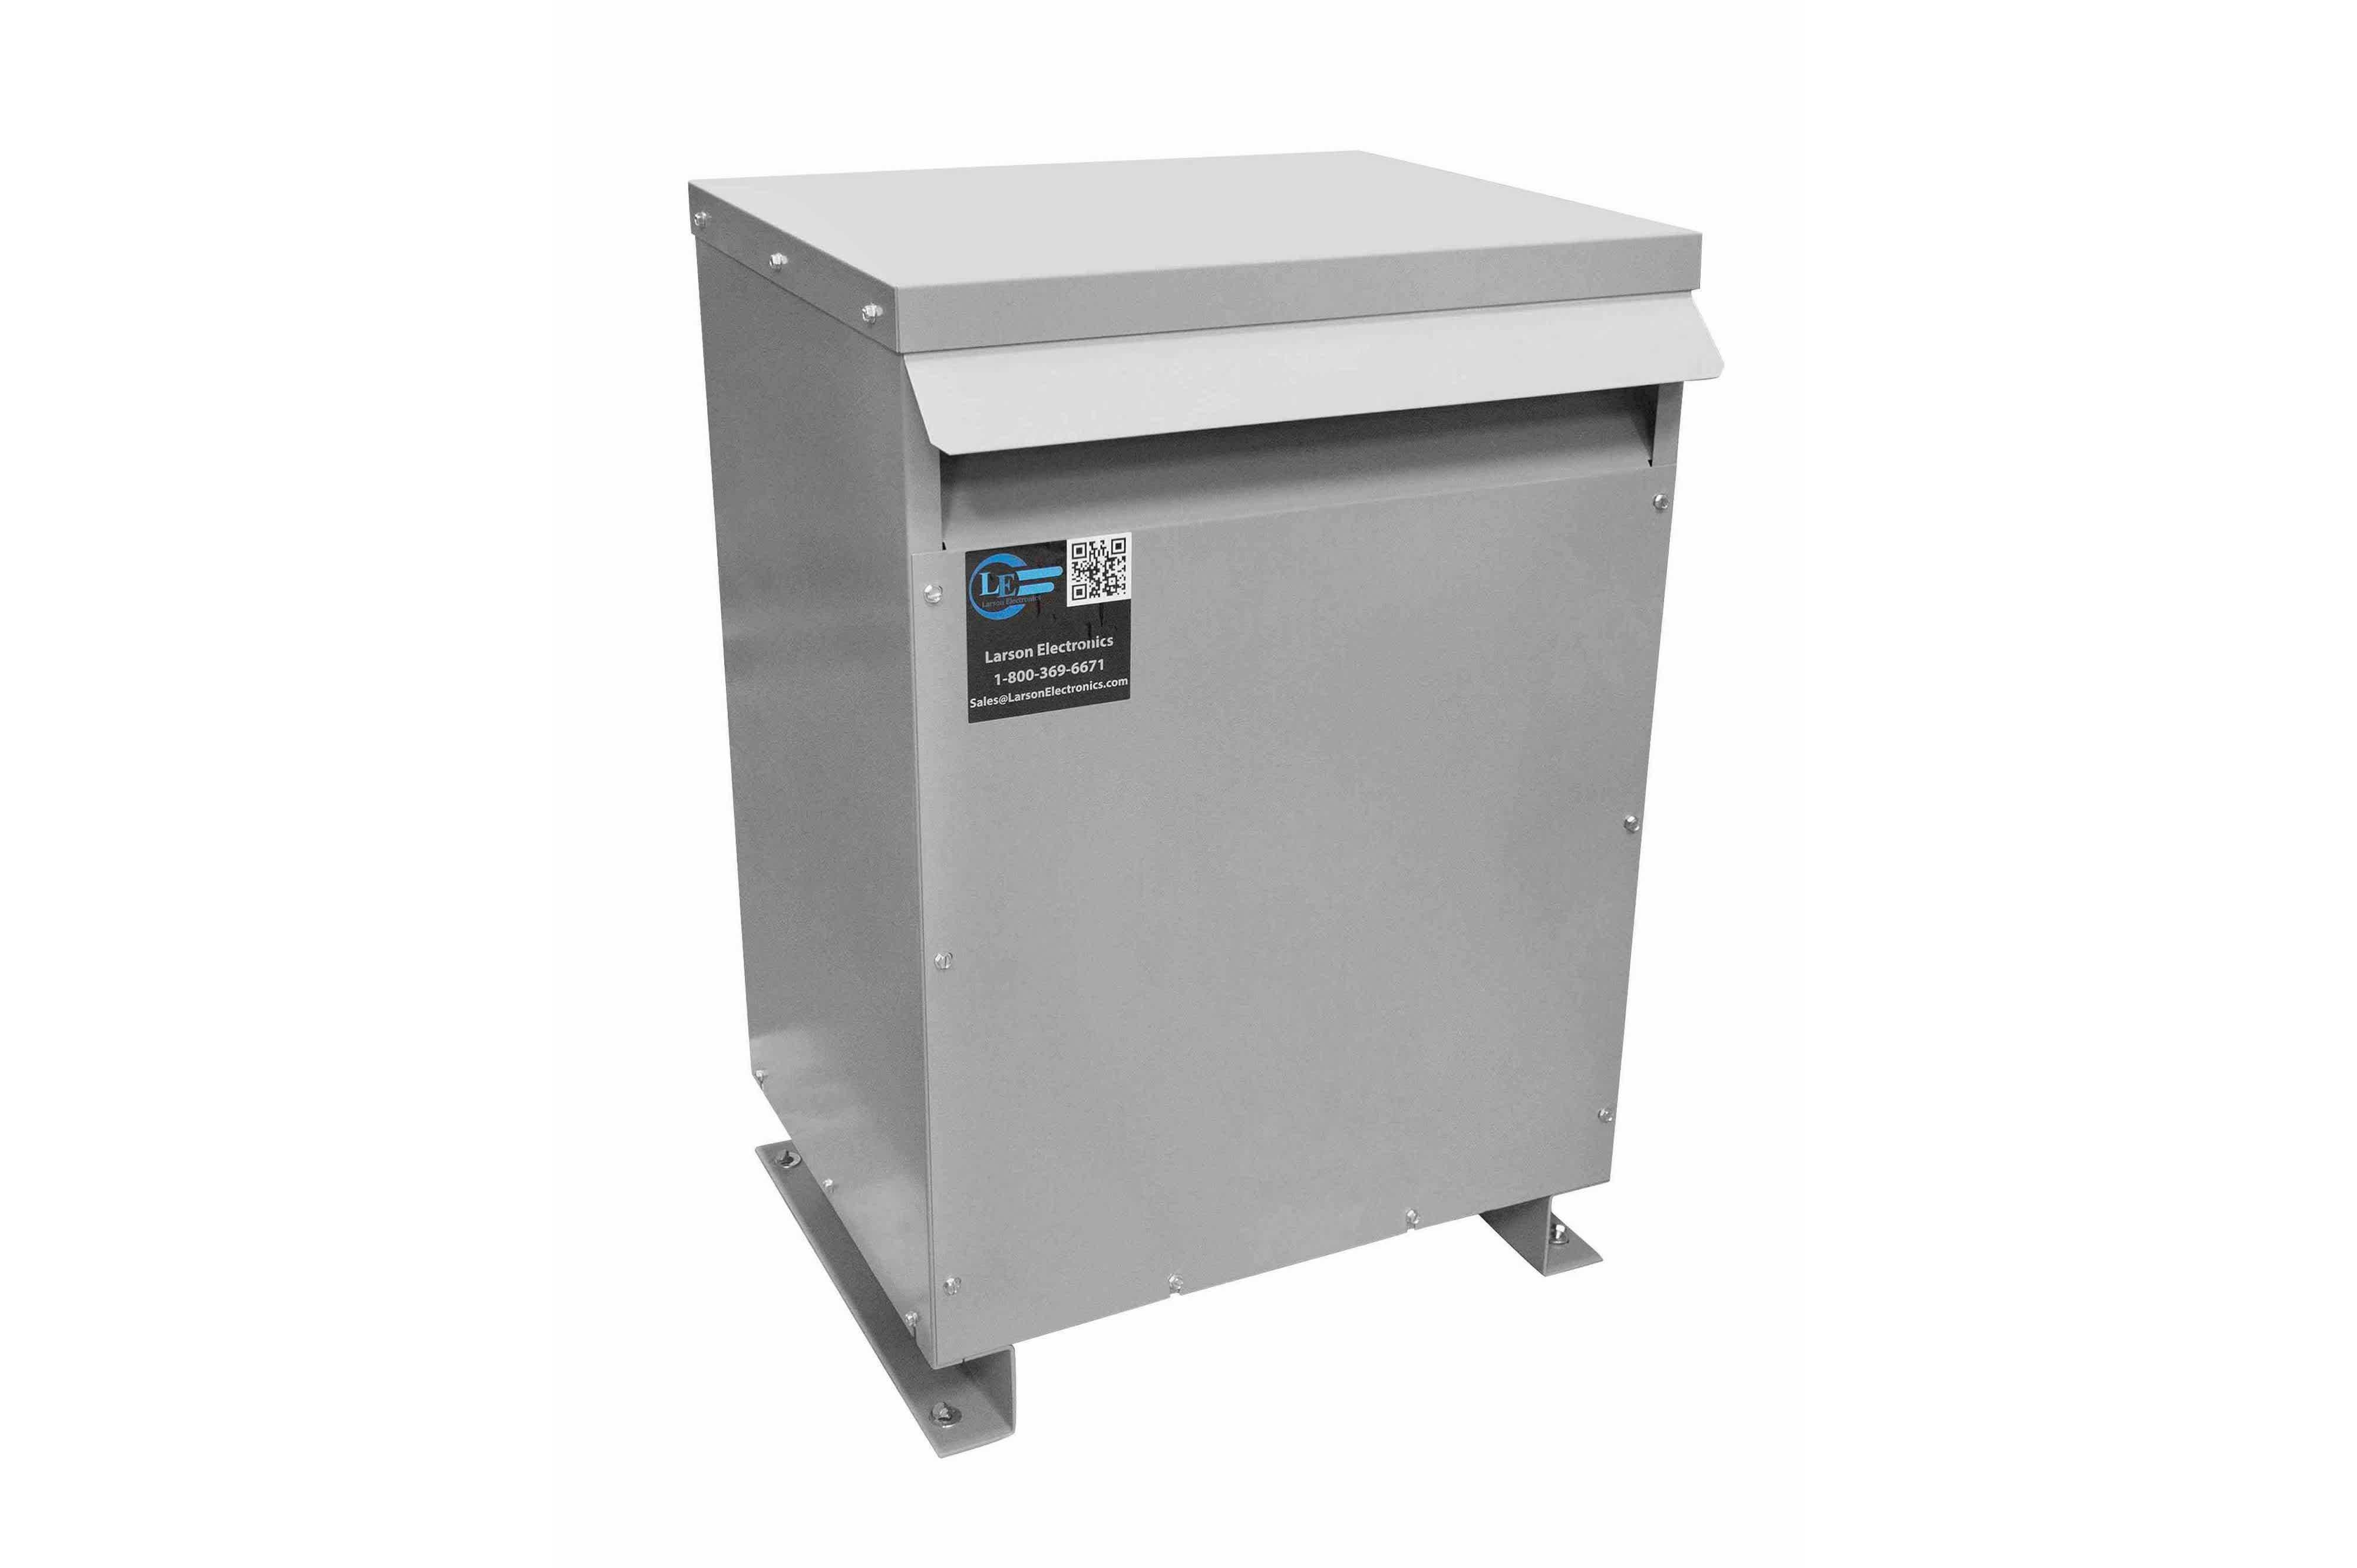 112.5 kVA 3PH Isolation Transformer, 600V Wye Primary, 208Y/120 Wye-N Secondary, N3R, Ventilated, 60 Hz